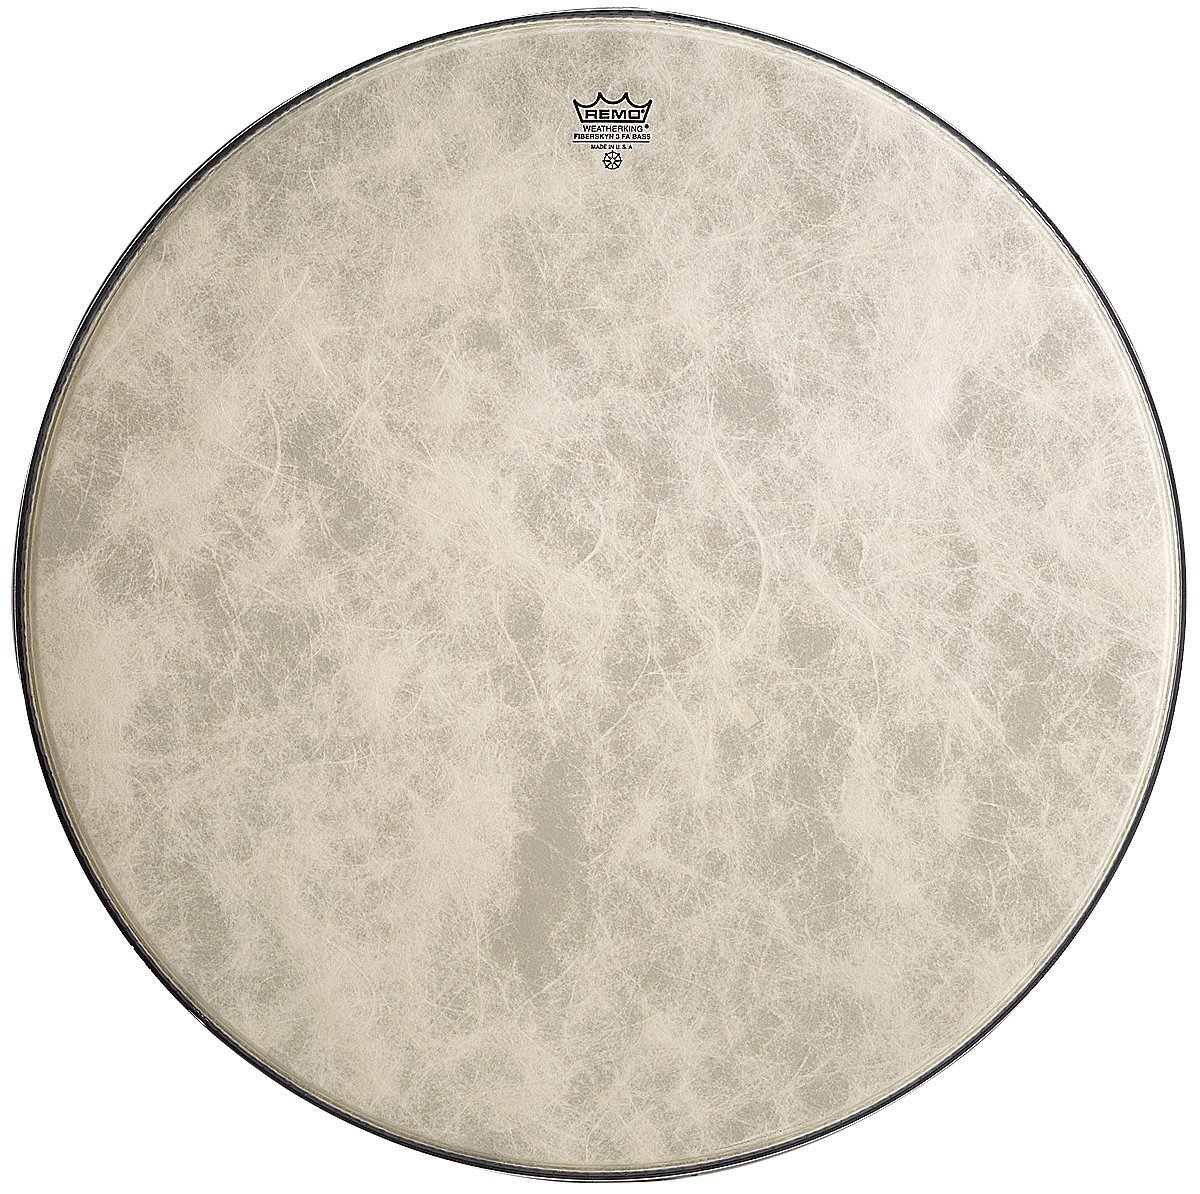 Remo FA1522-00 22-Inch Fiberskyn 3 Ambassador Bass Drum Head by Remo